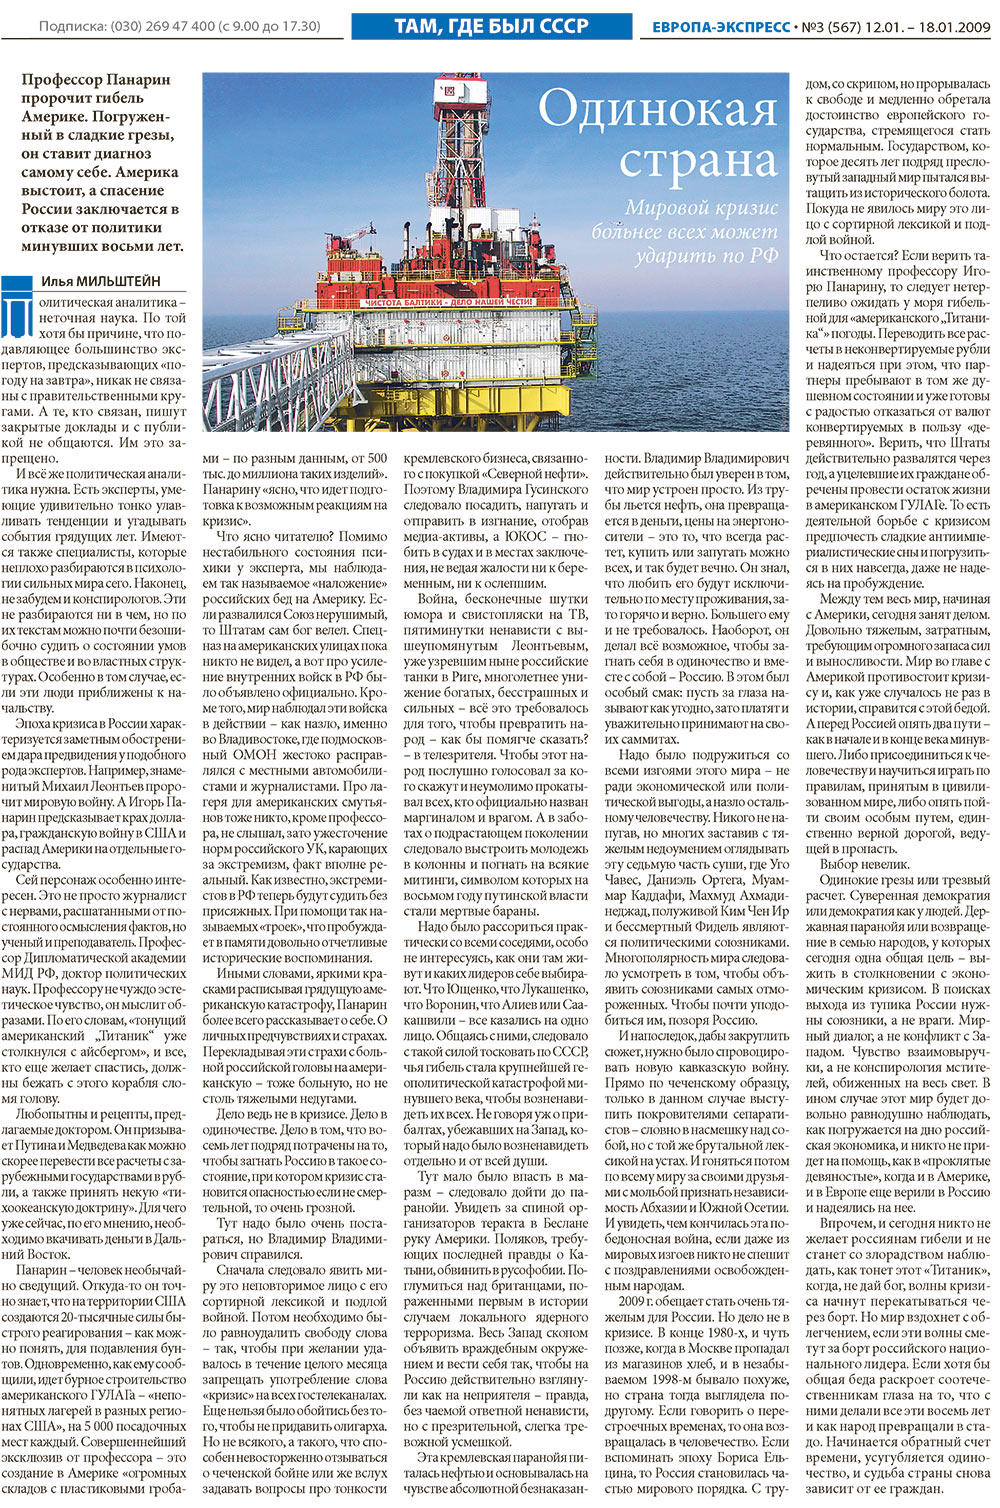 Европа экспресс (газета). 2009 год, номер 1, стр. 11